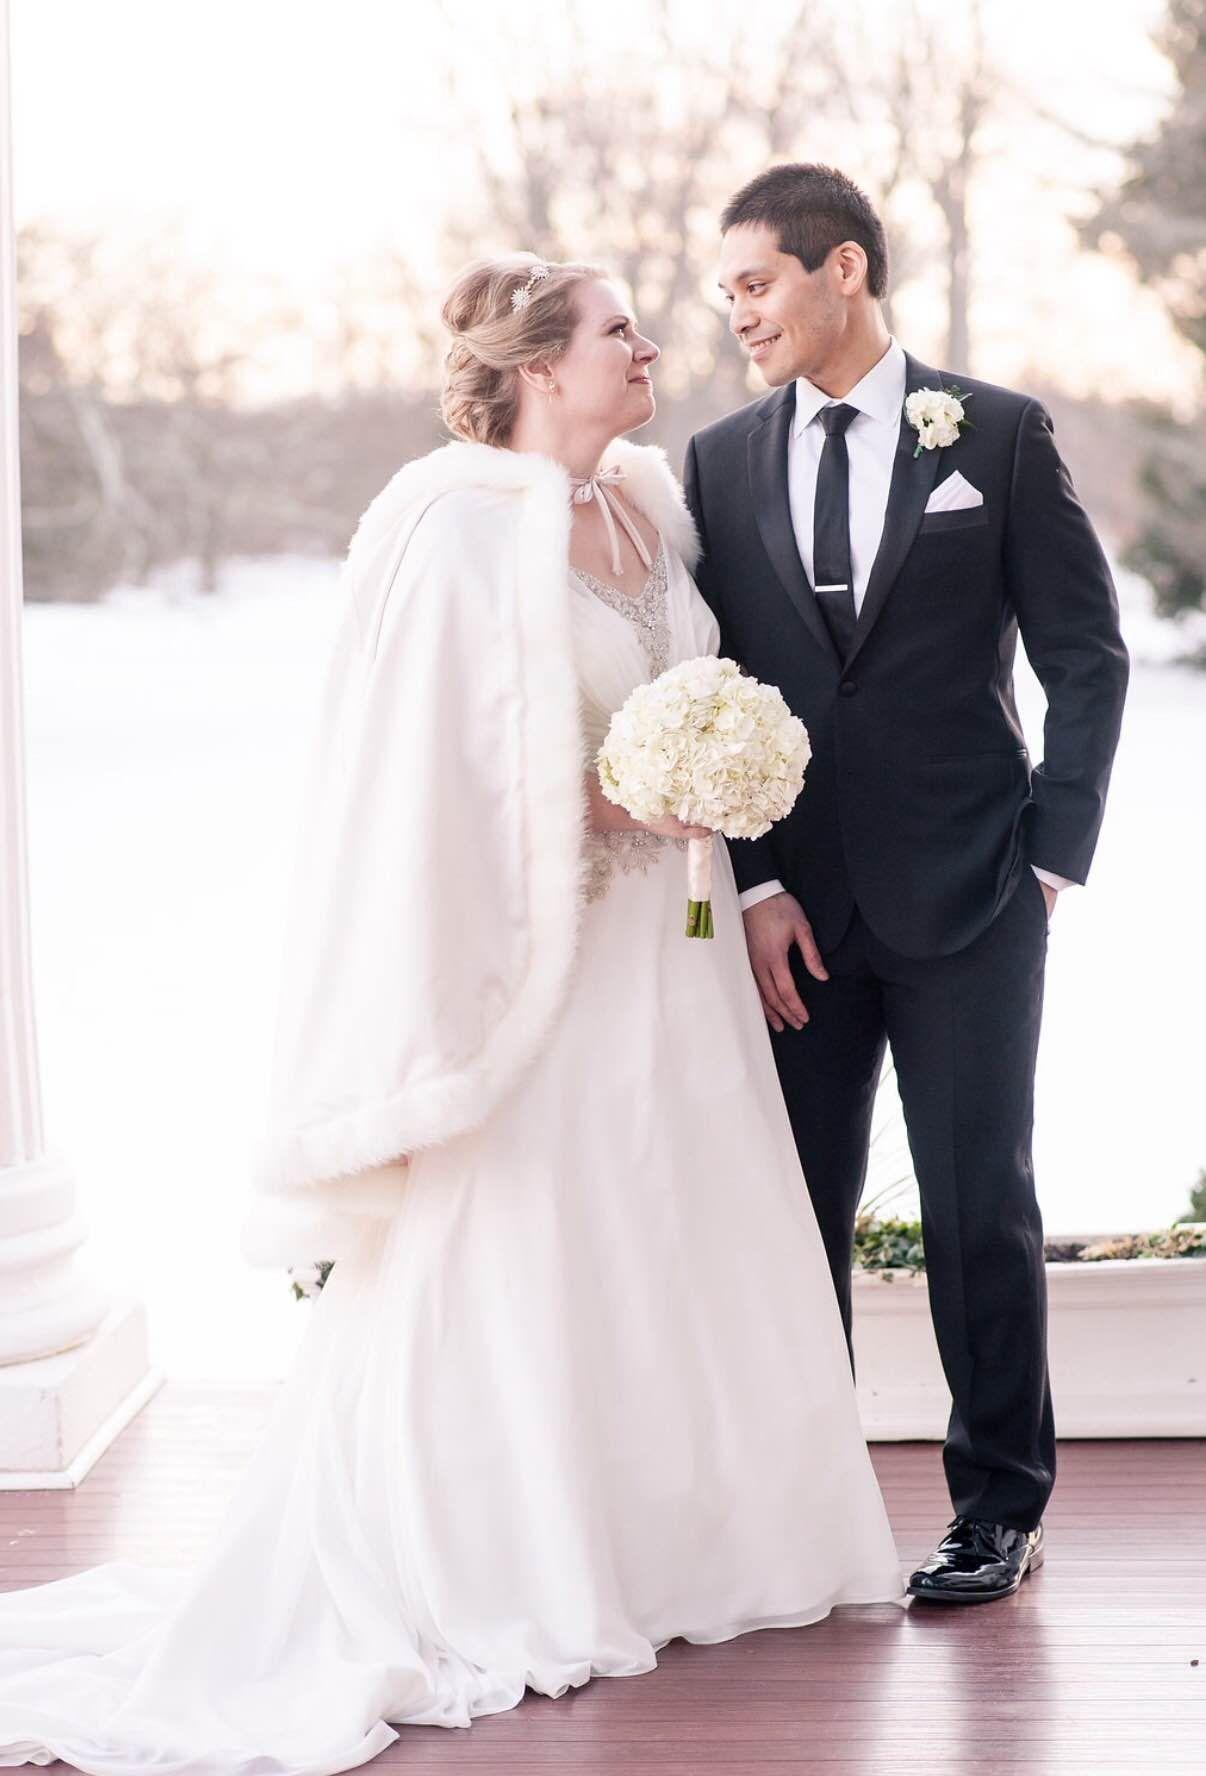 Winter Wedding Dress at Historic Rosemont Manor in Northern Virginia ...